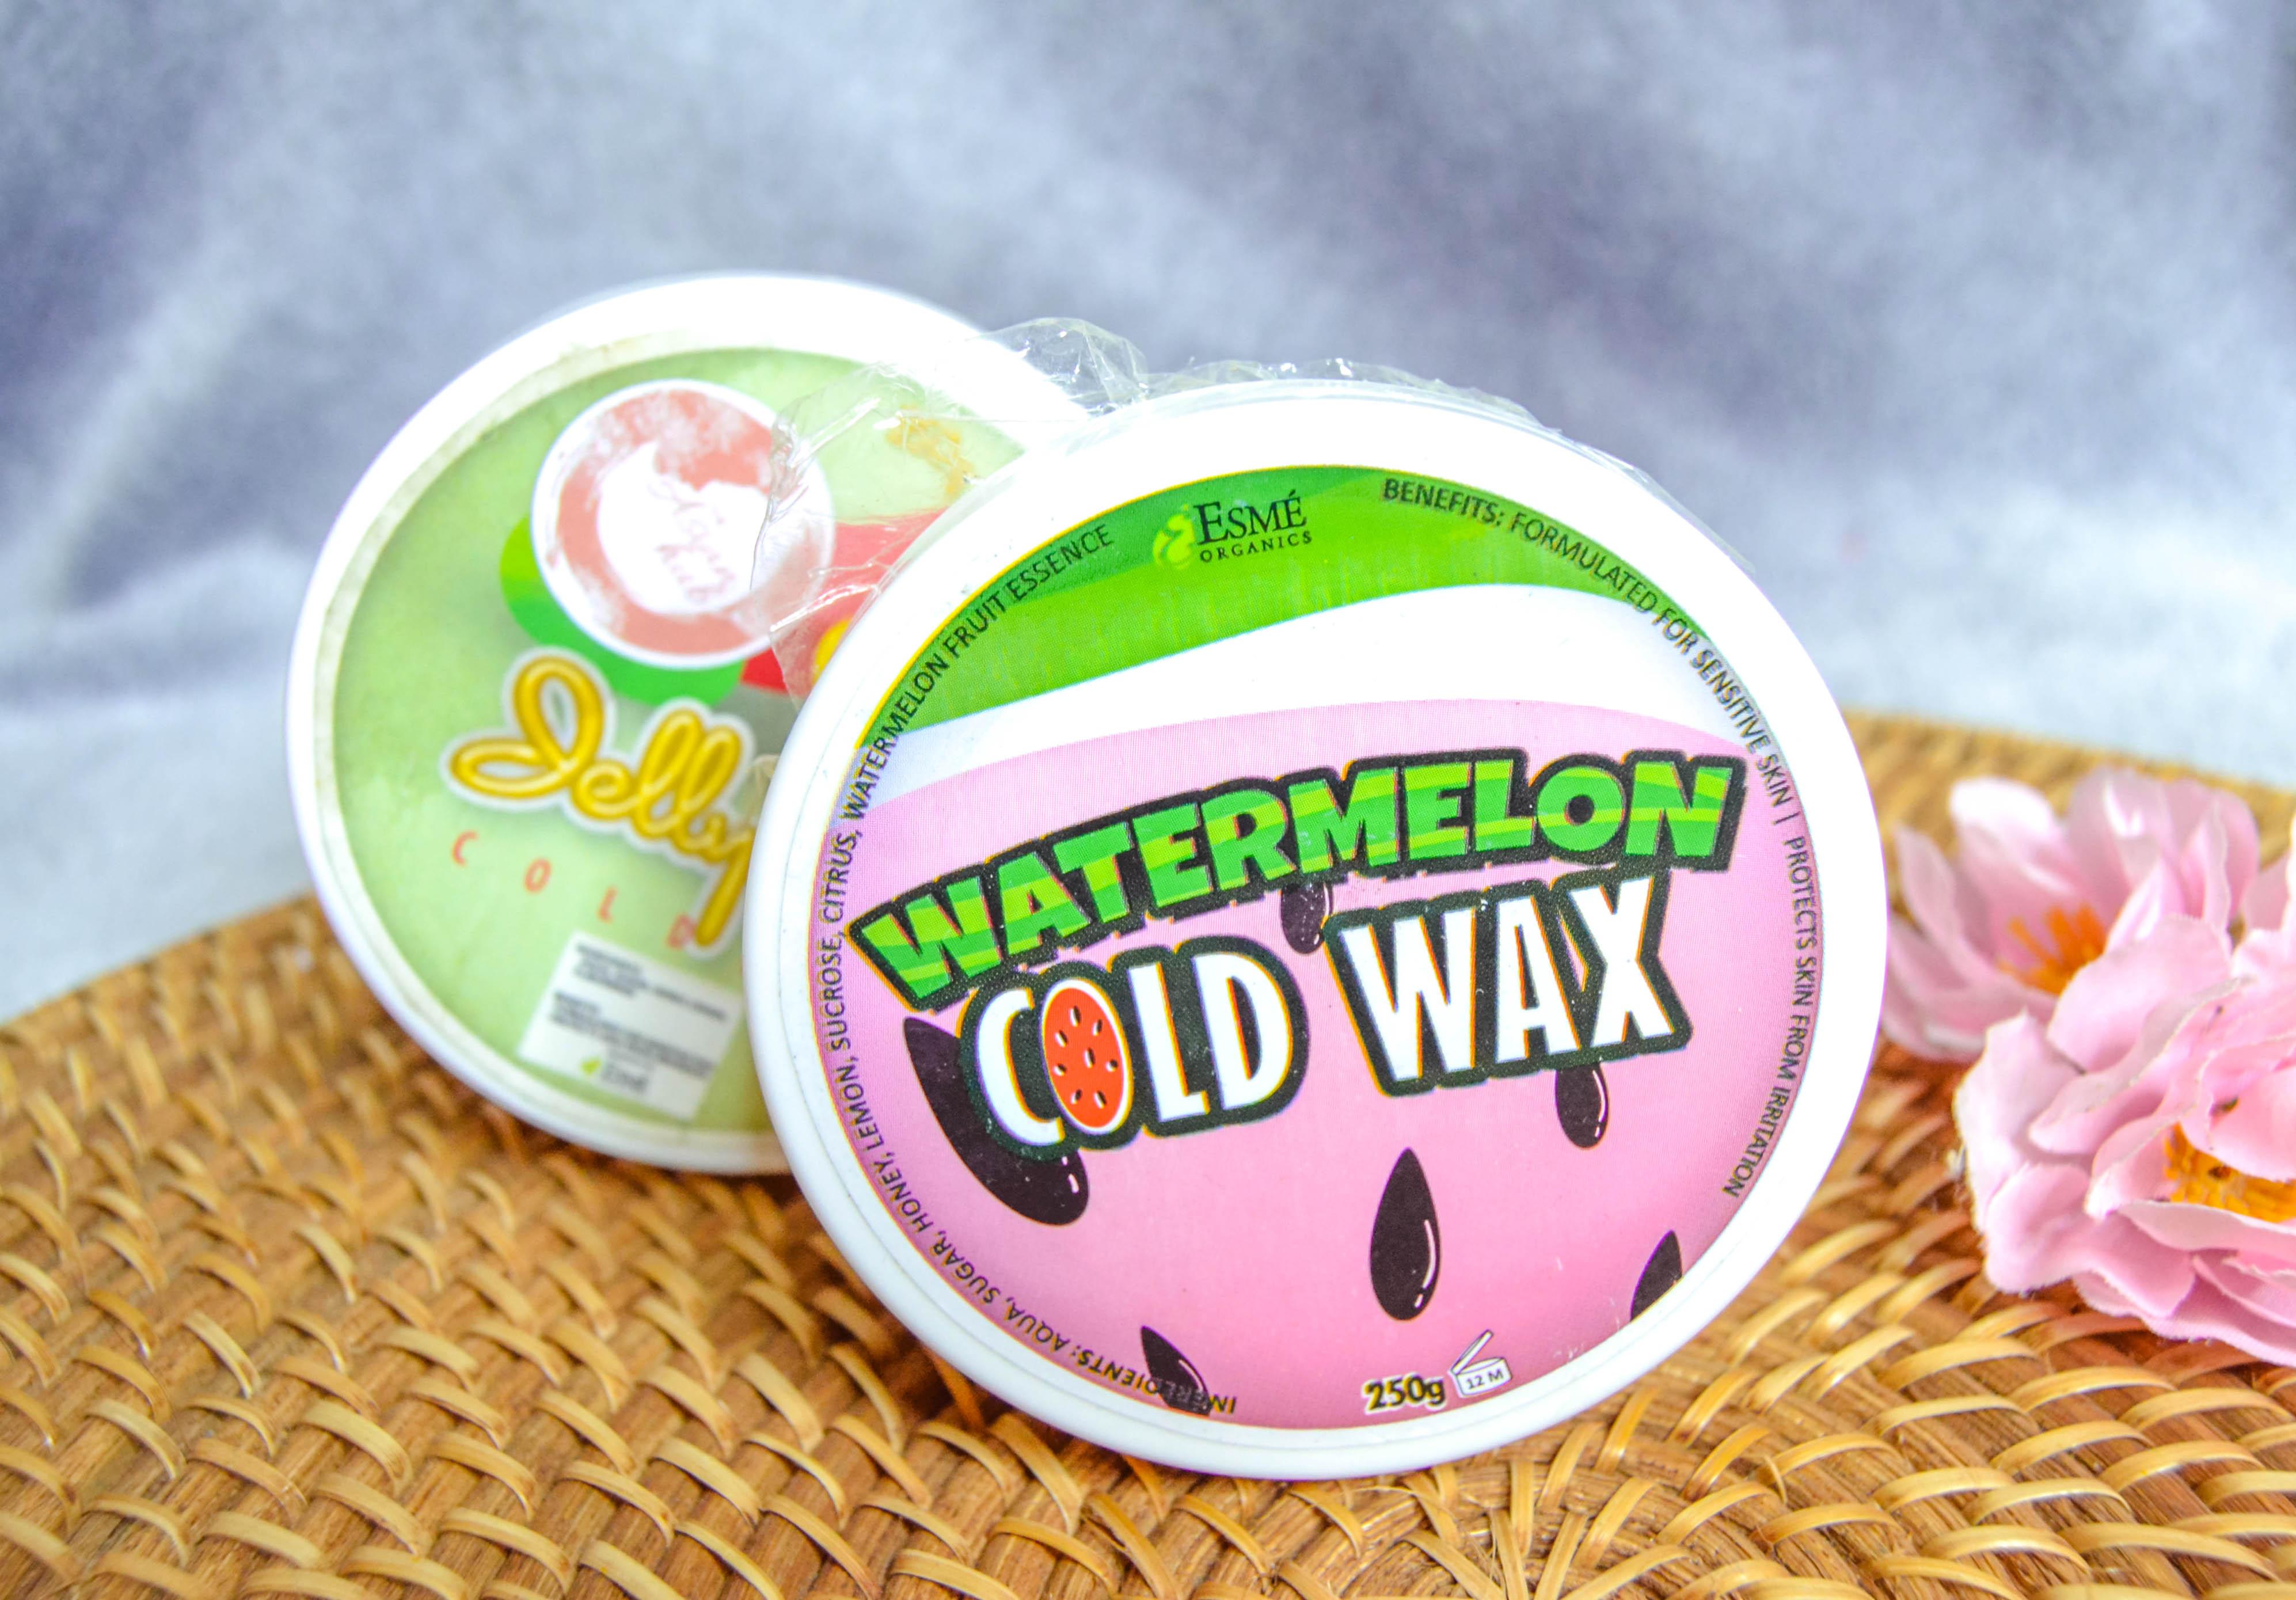 Esme organics cold wax review | belleandbrushes